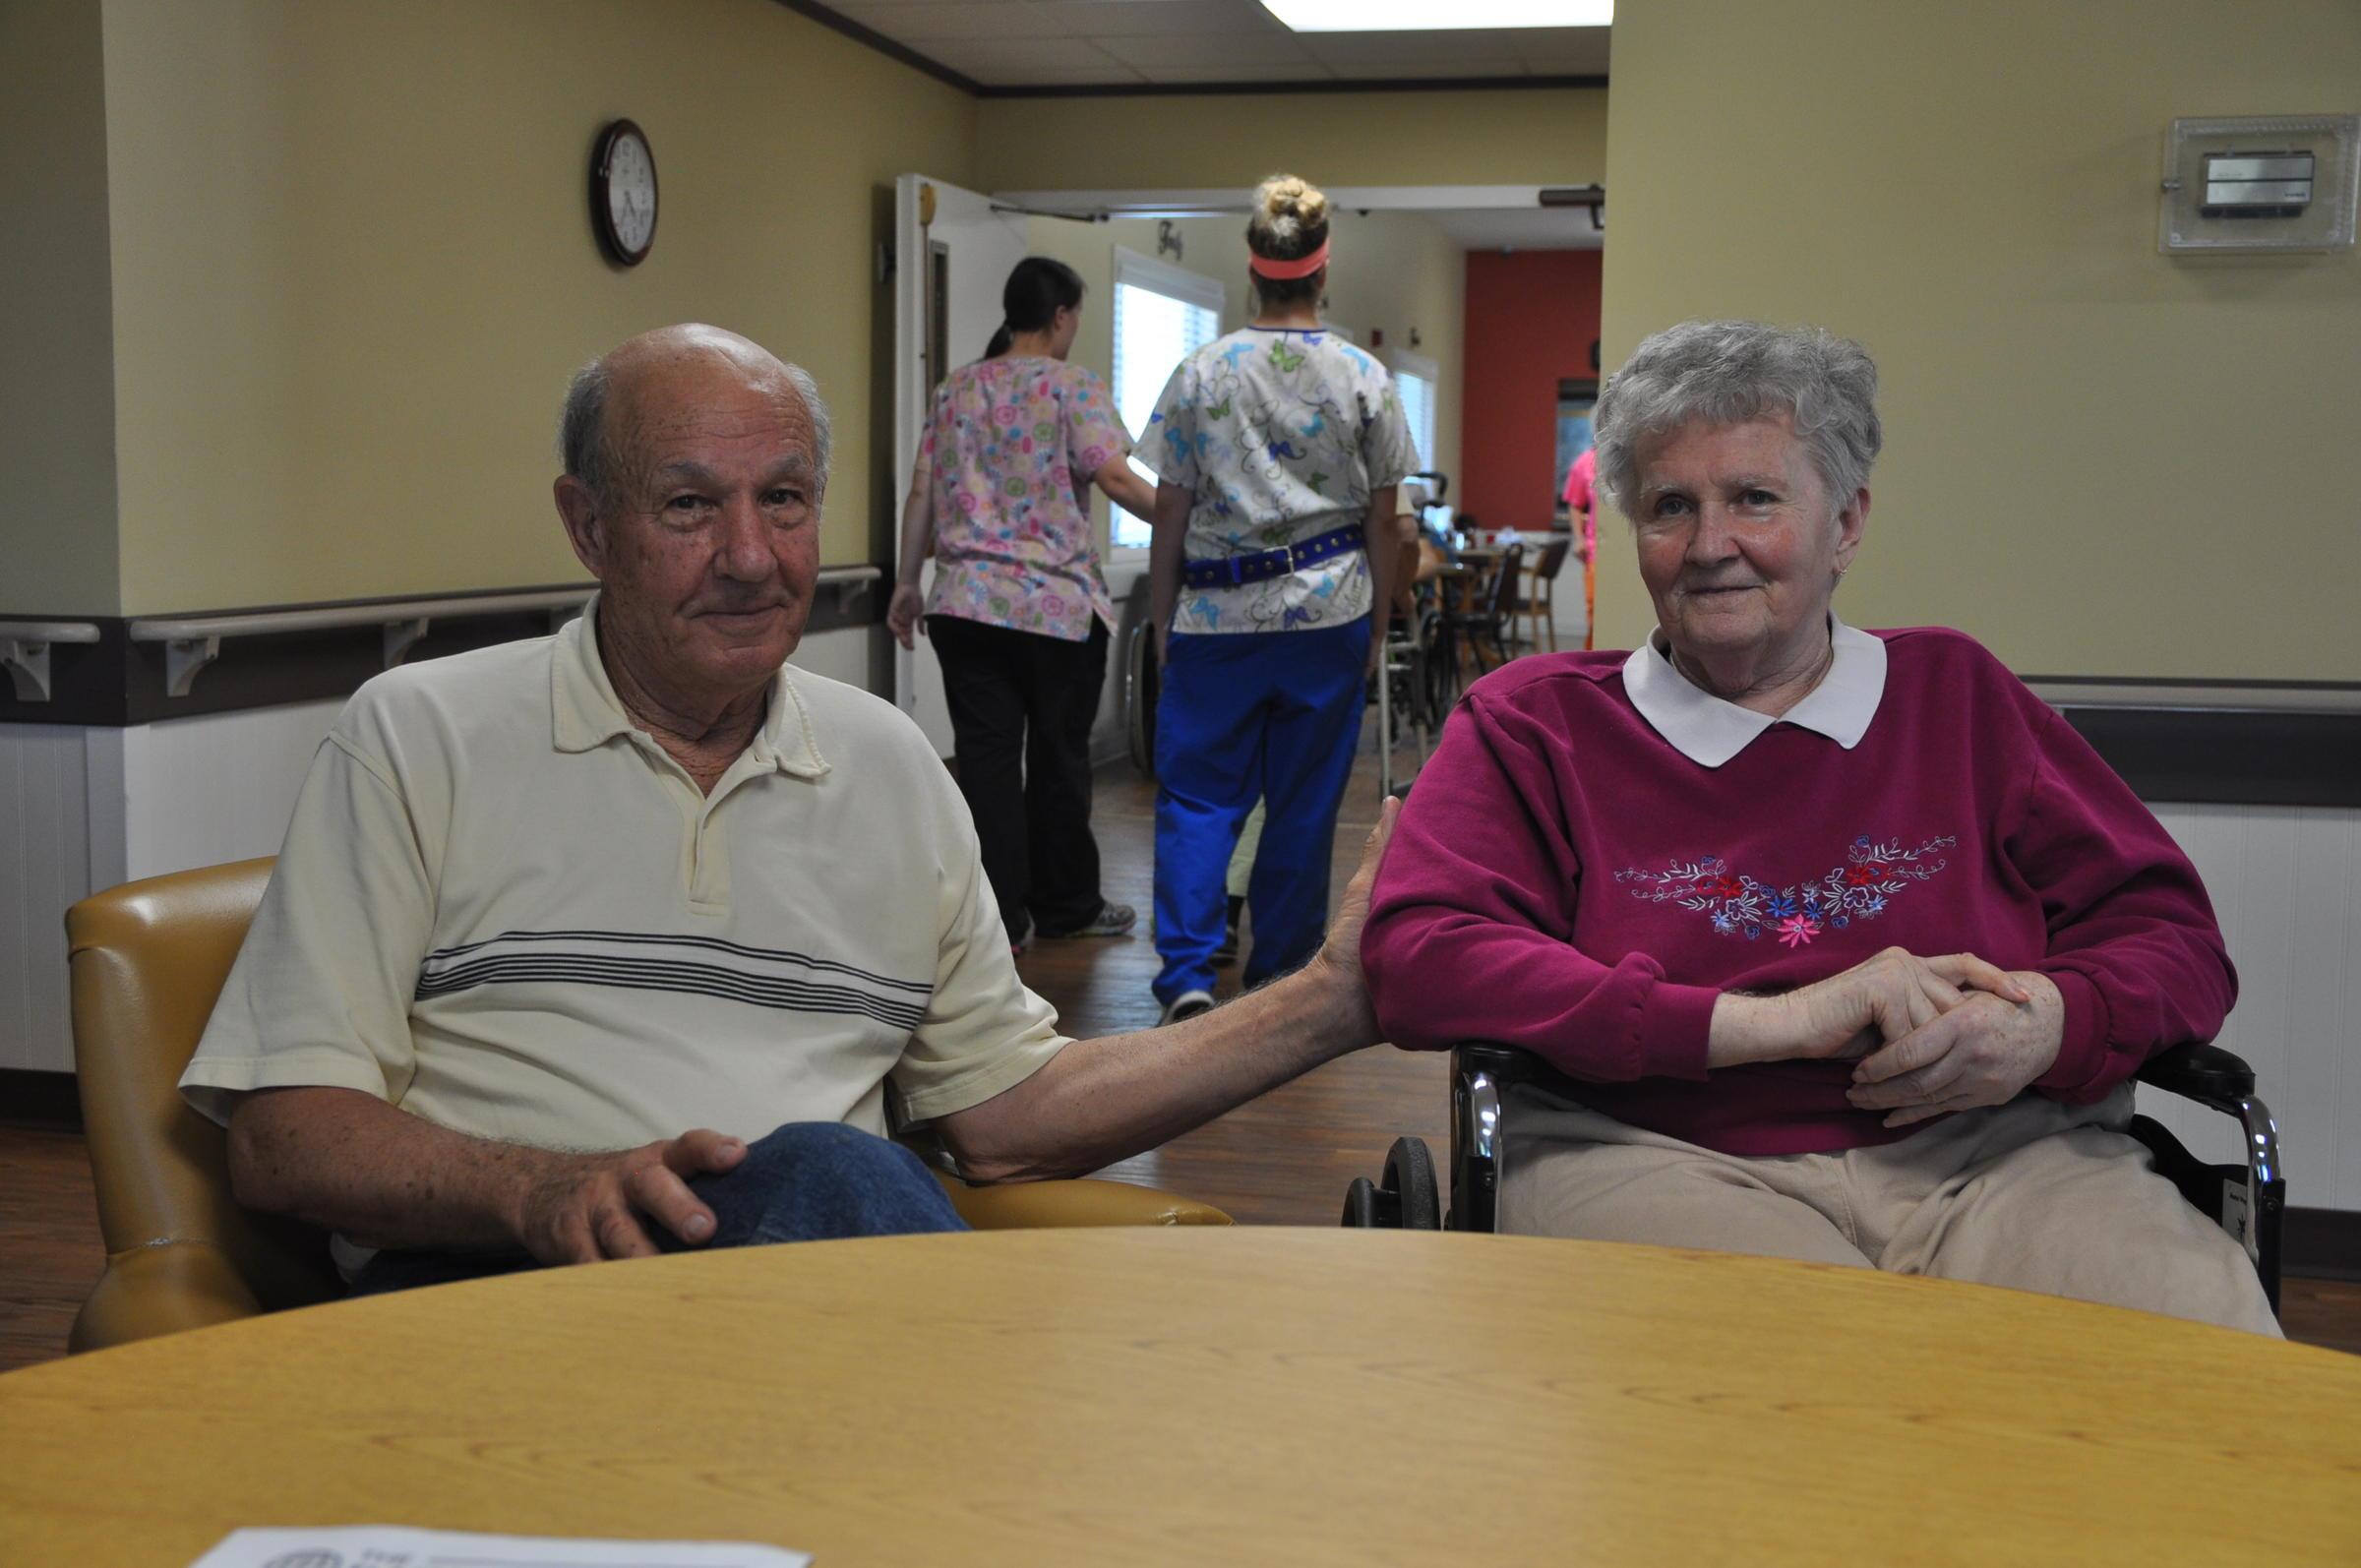 Nursing Homes In Missouri That Accept Medicaid